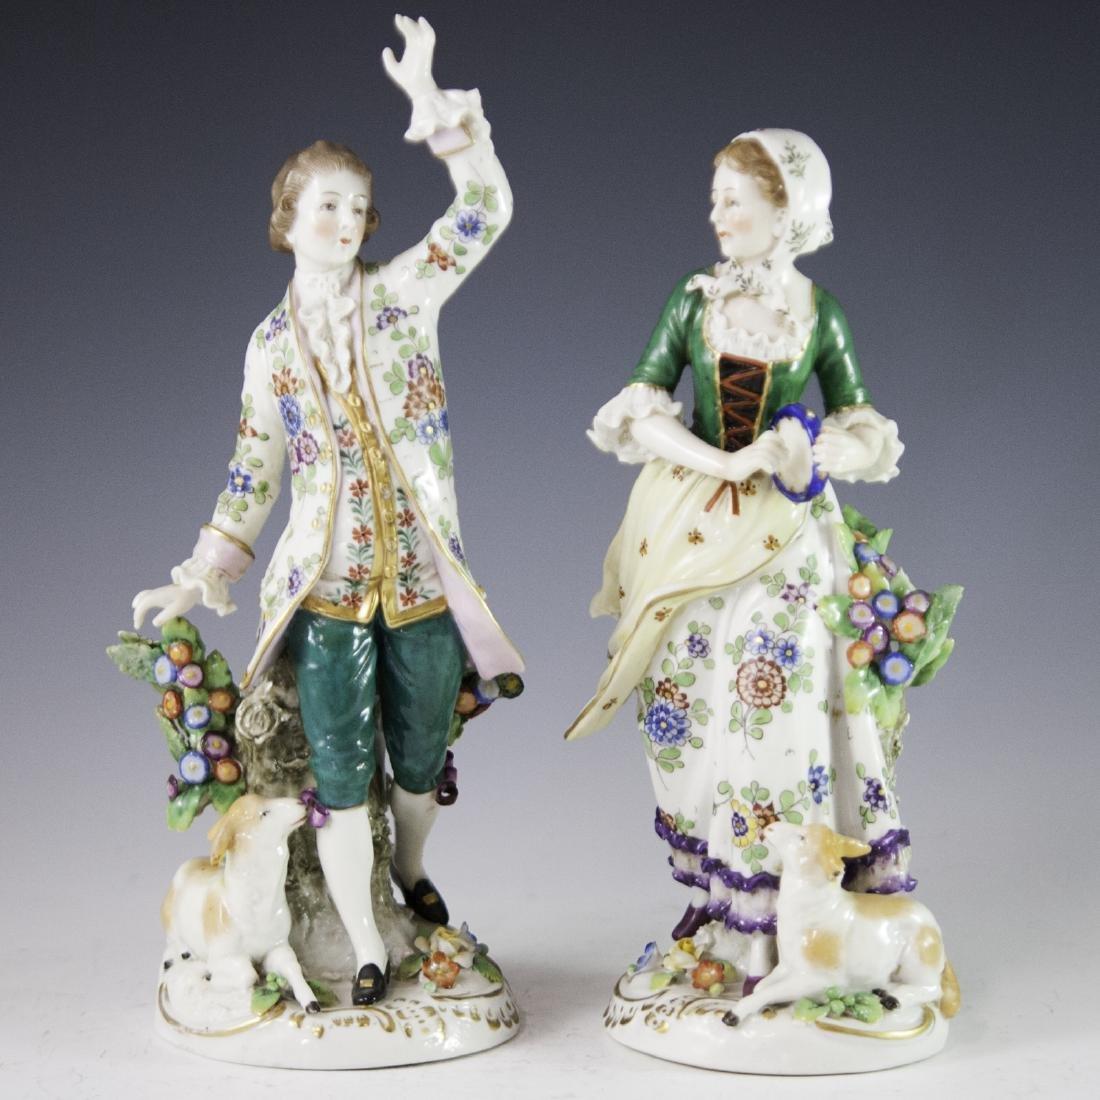 Chelsea Style Porcelain Figurines